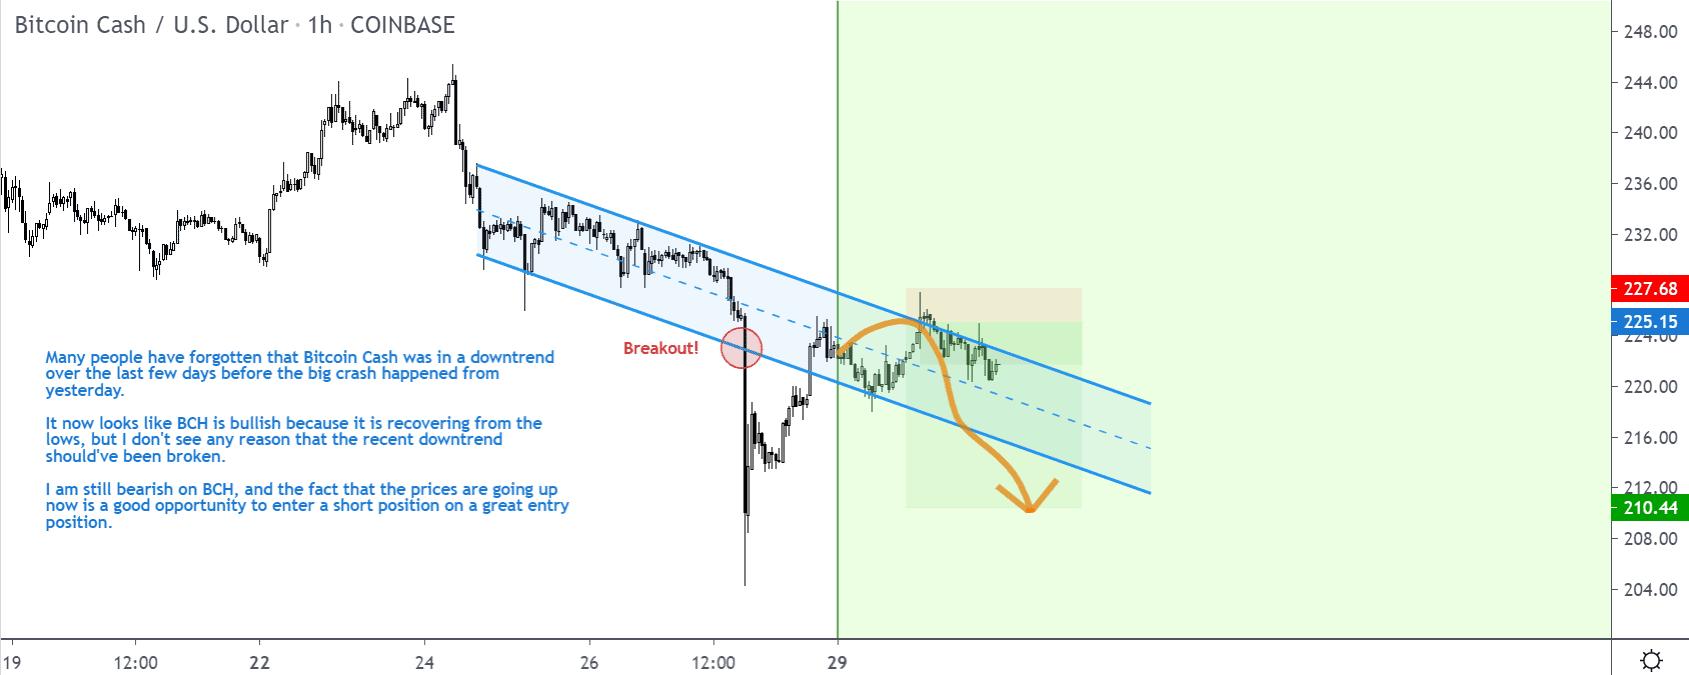 Bitcoin Cash price chart 2 - 30 June